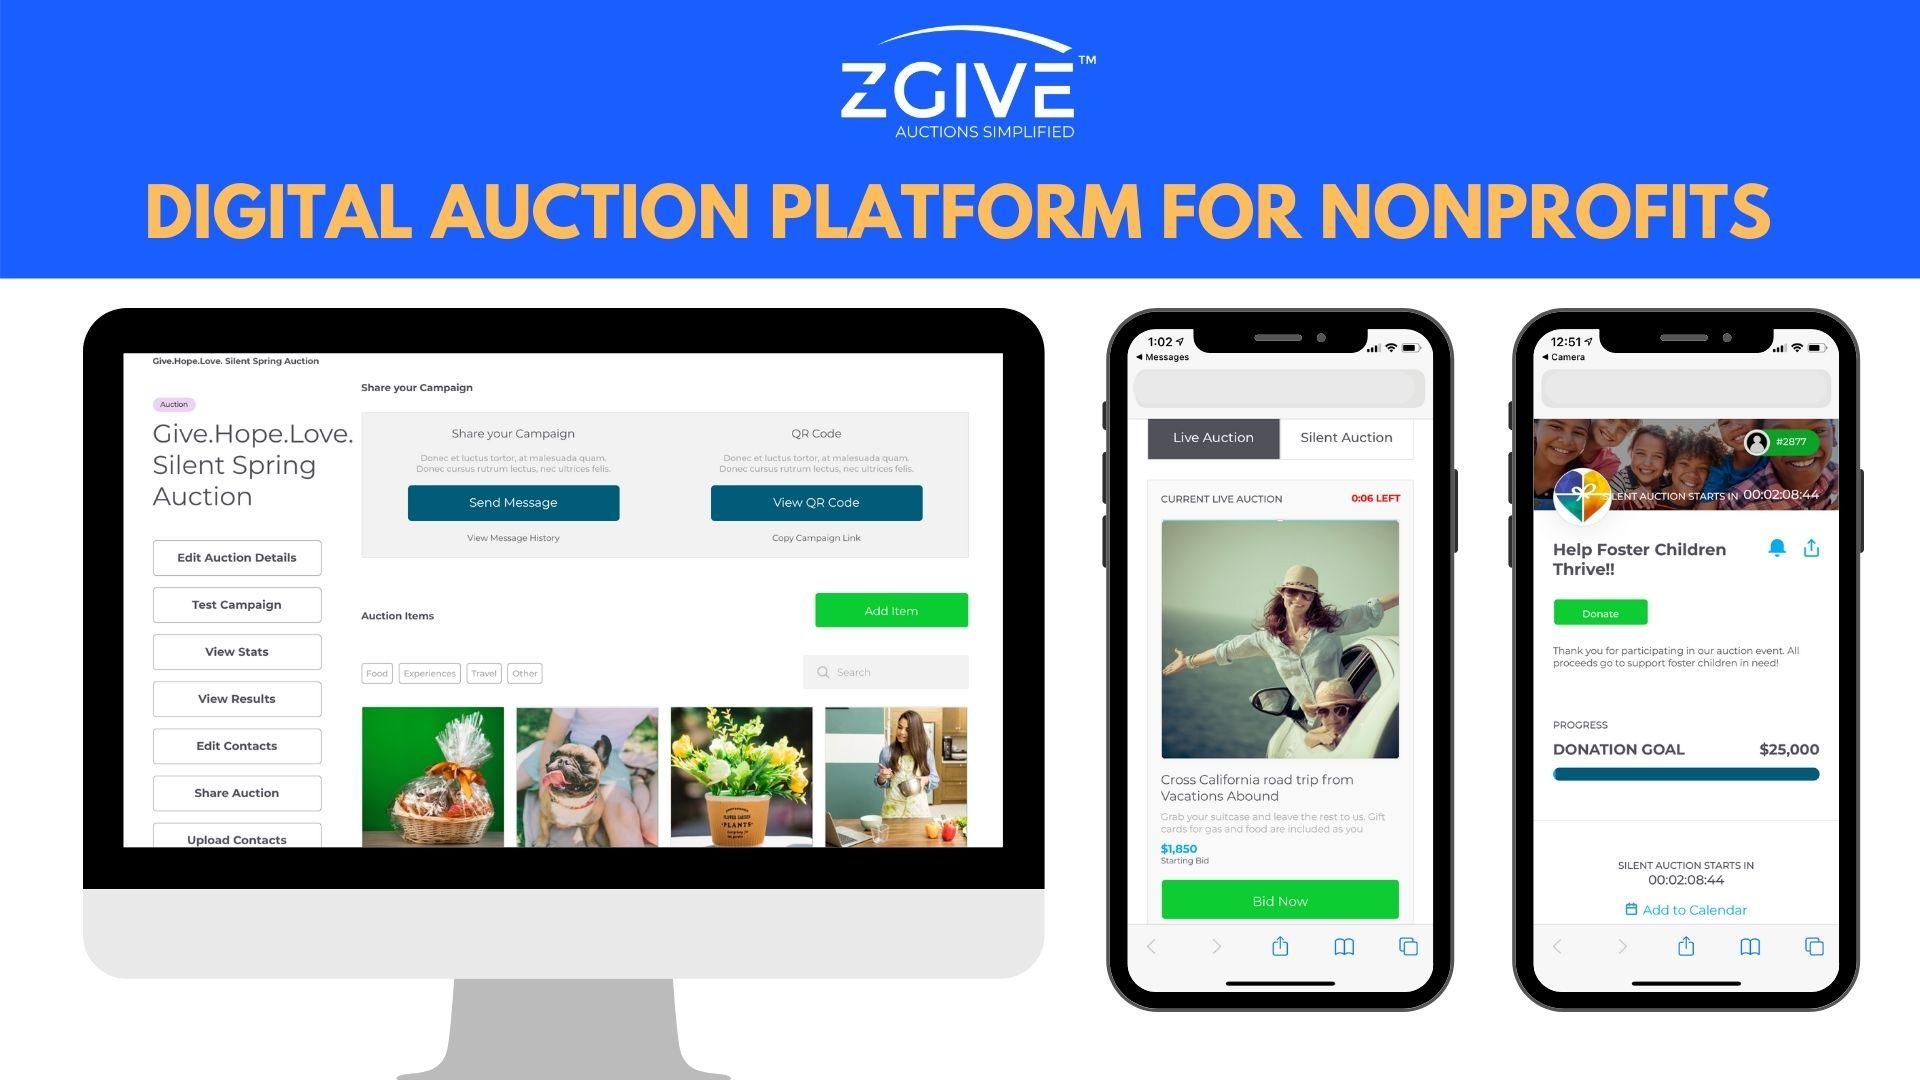 ZGIVE Digital Auction Platform